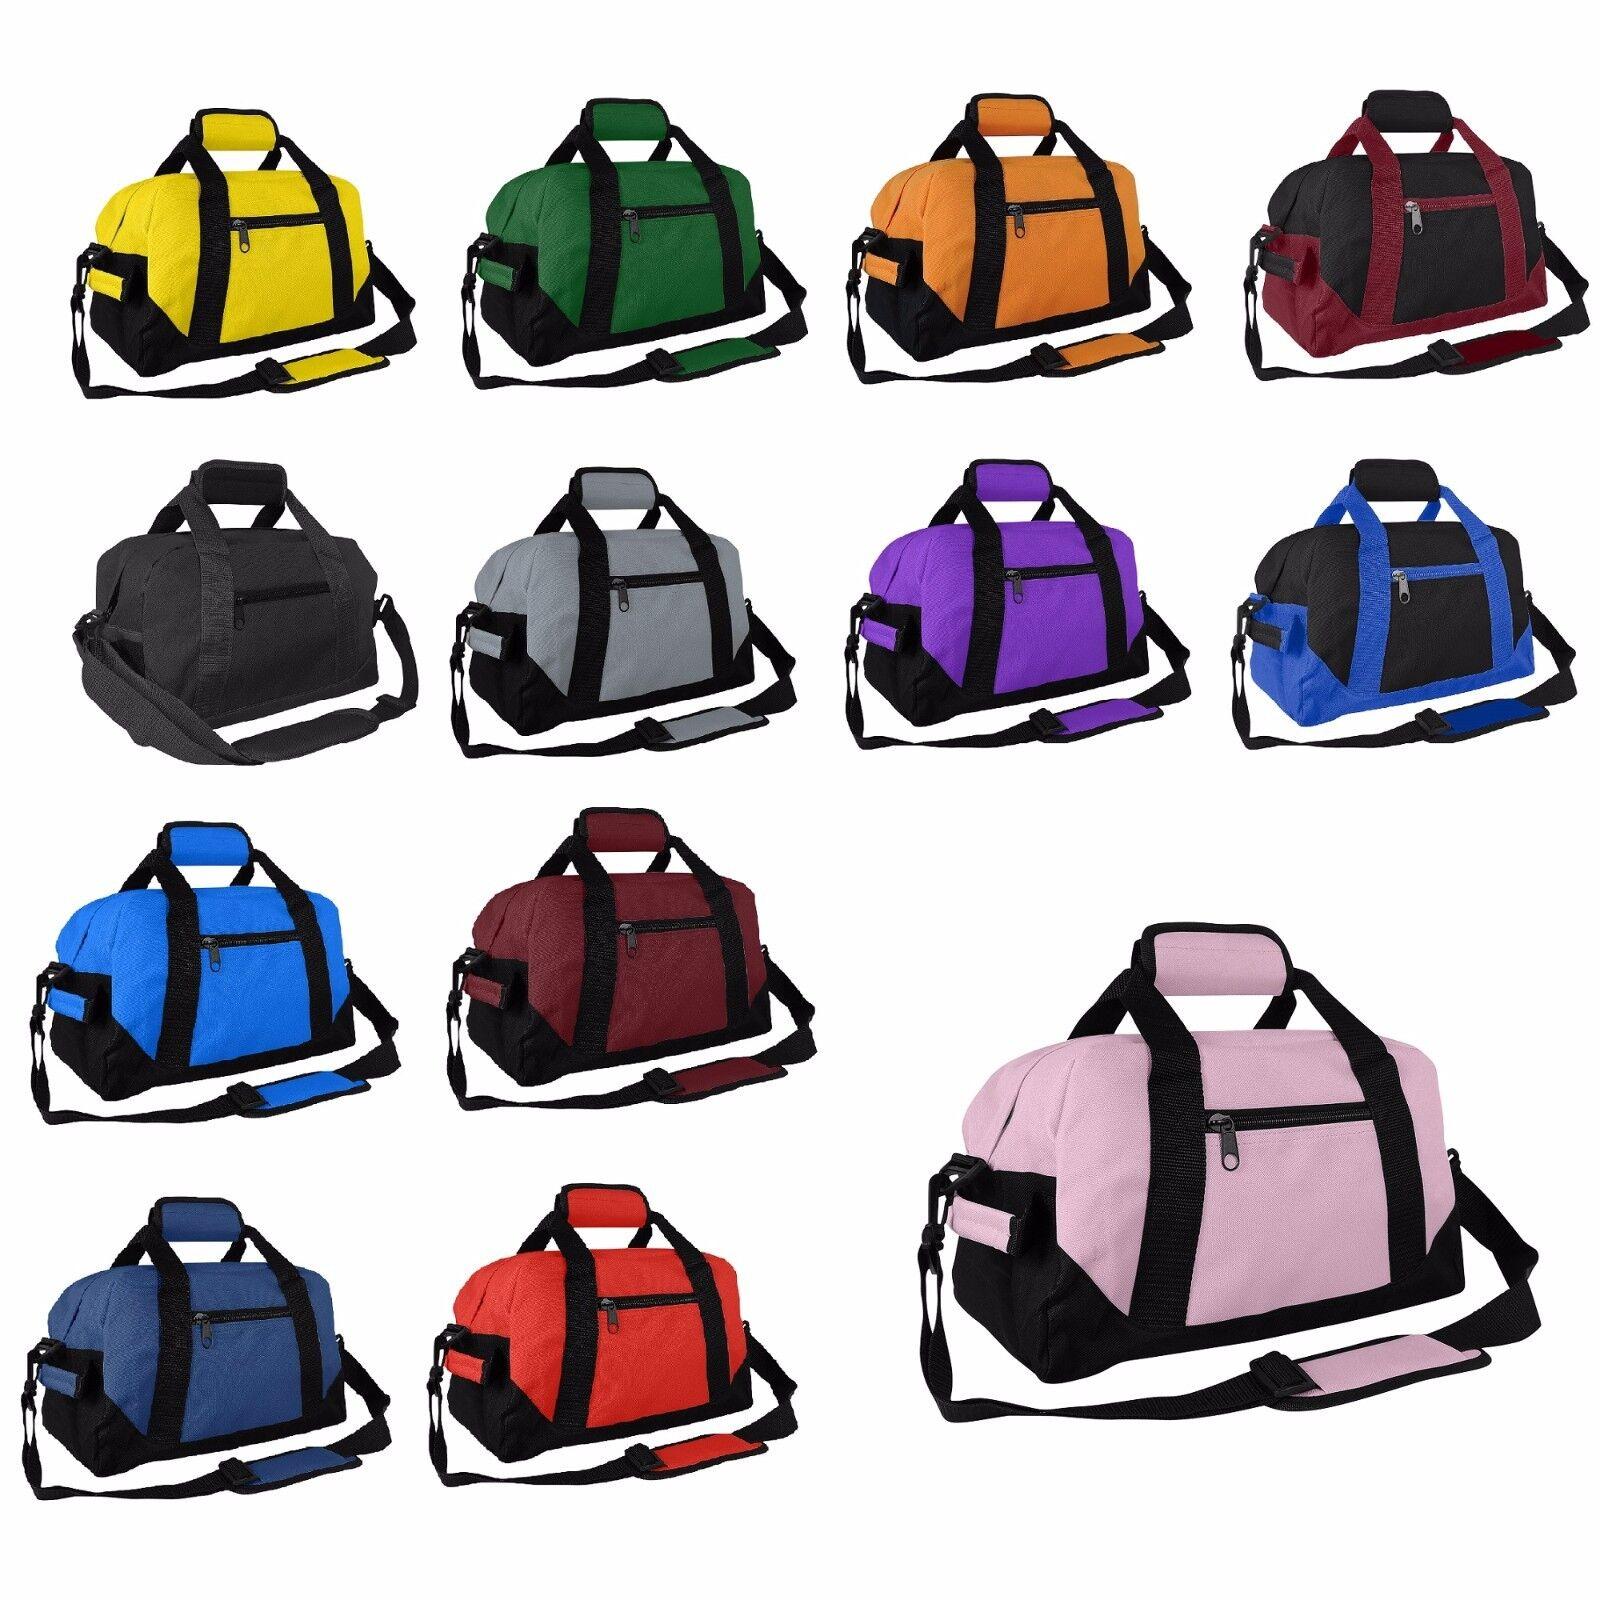 "DALIX 14"" Duffle Gym Mini Travel Bag Green Black Gray Blue R"